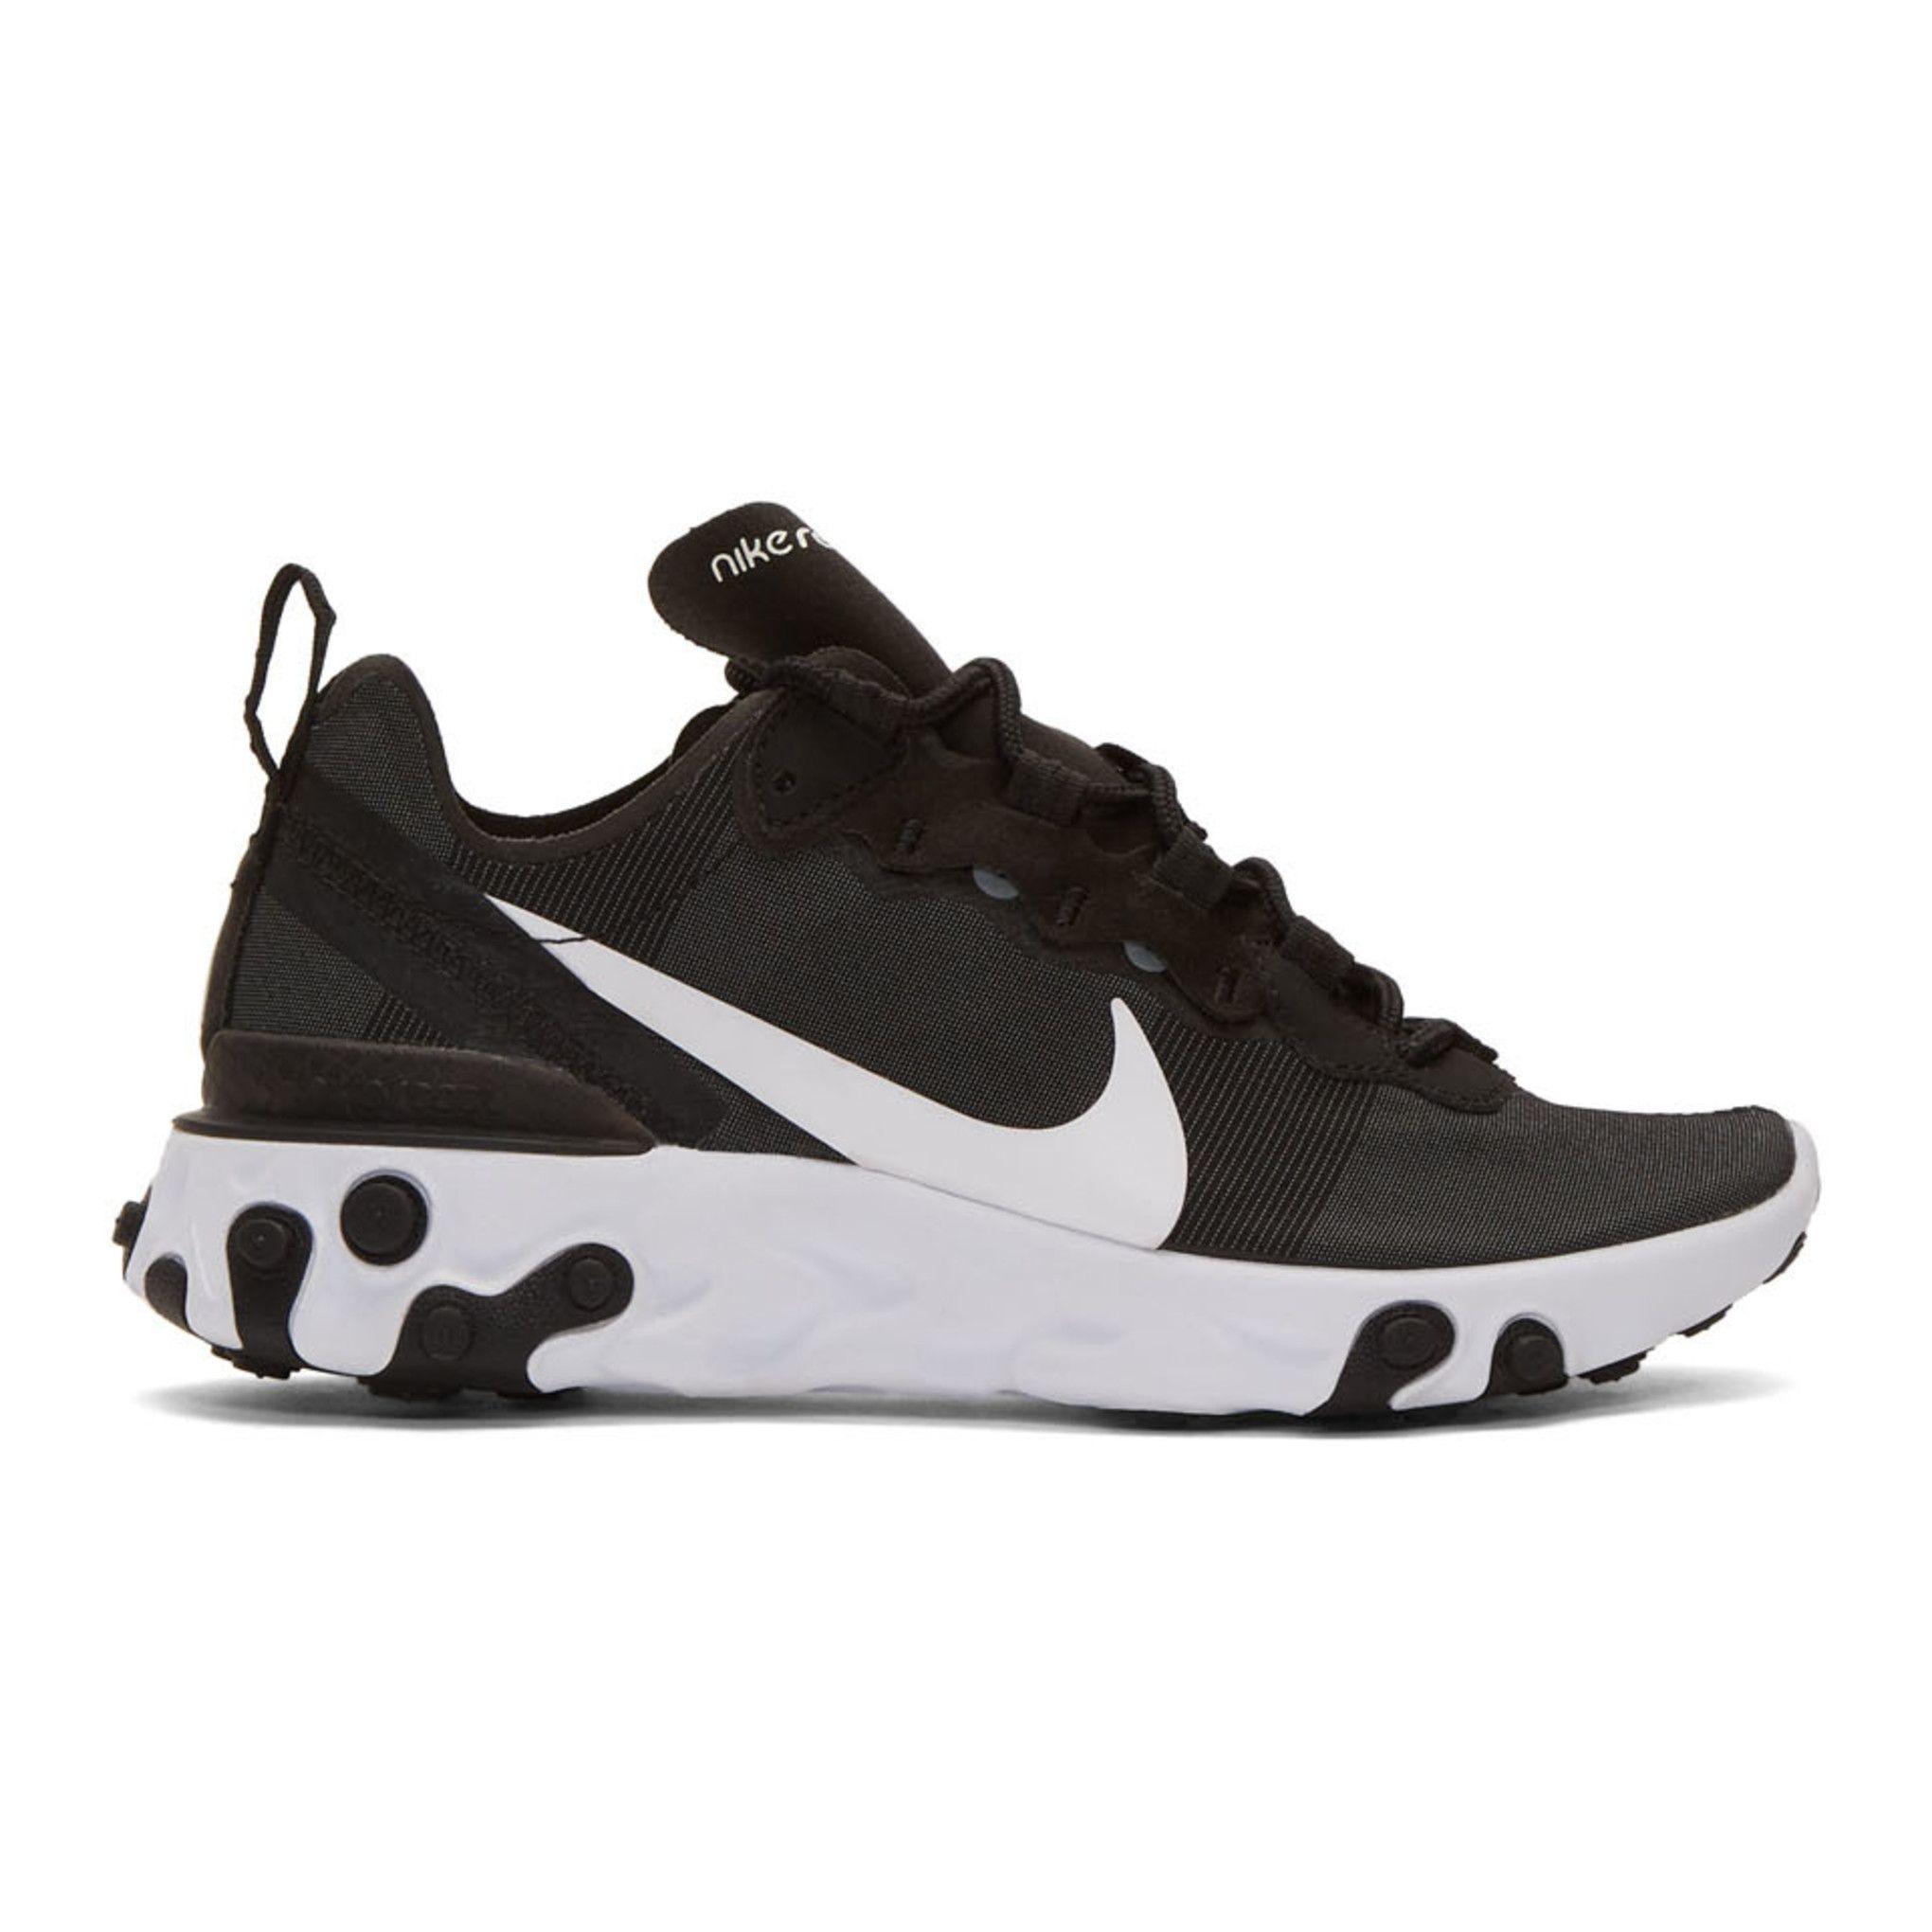 Nike Black React Element 55 Sneakers SSENSE Dior